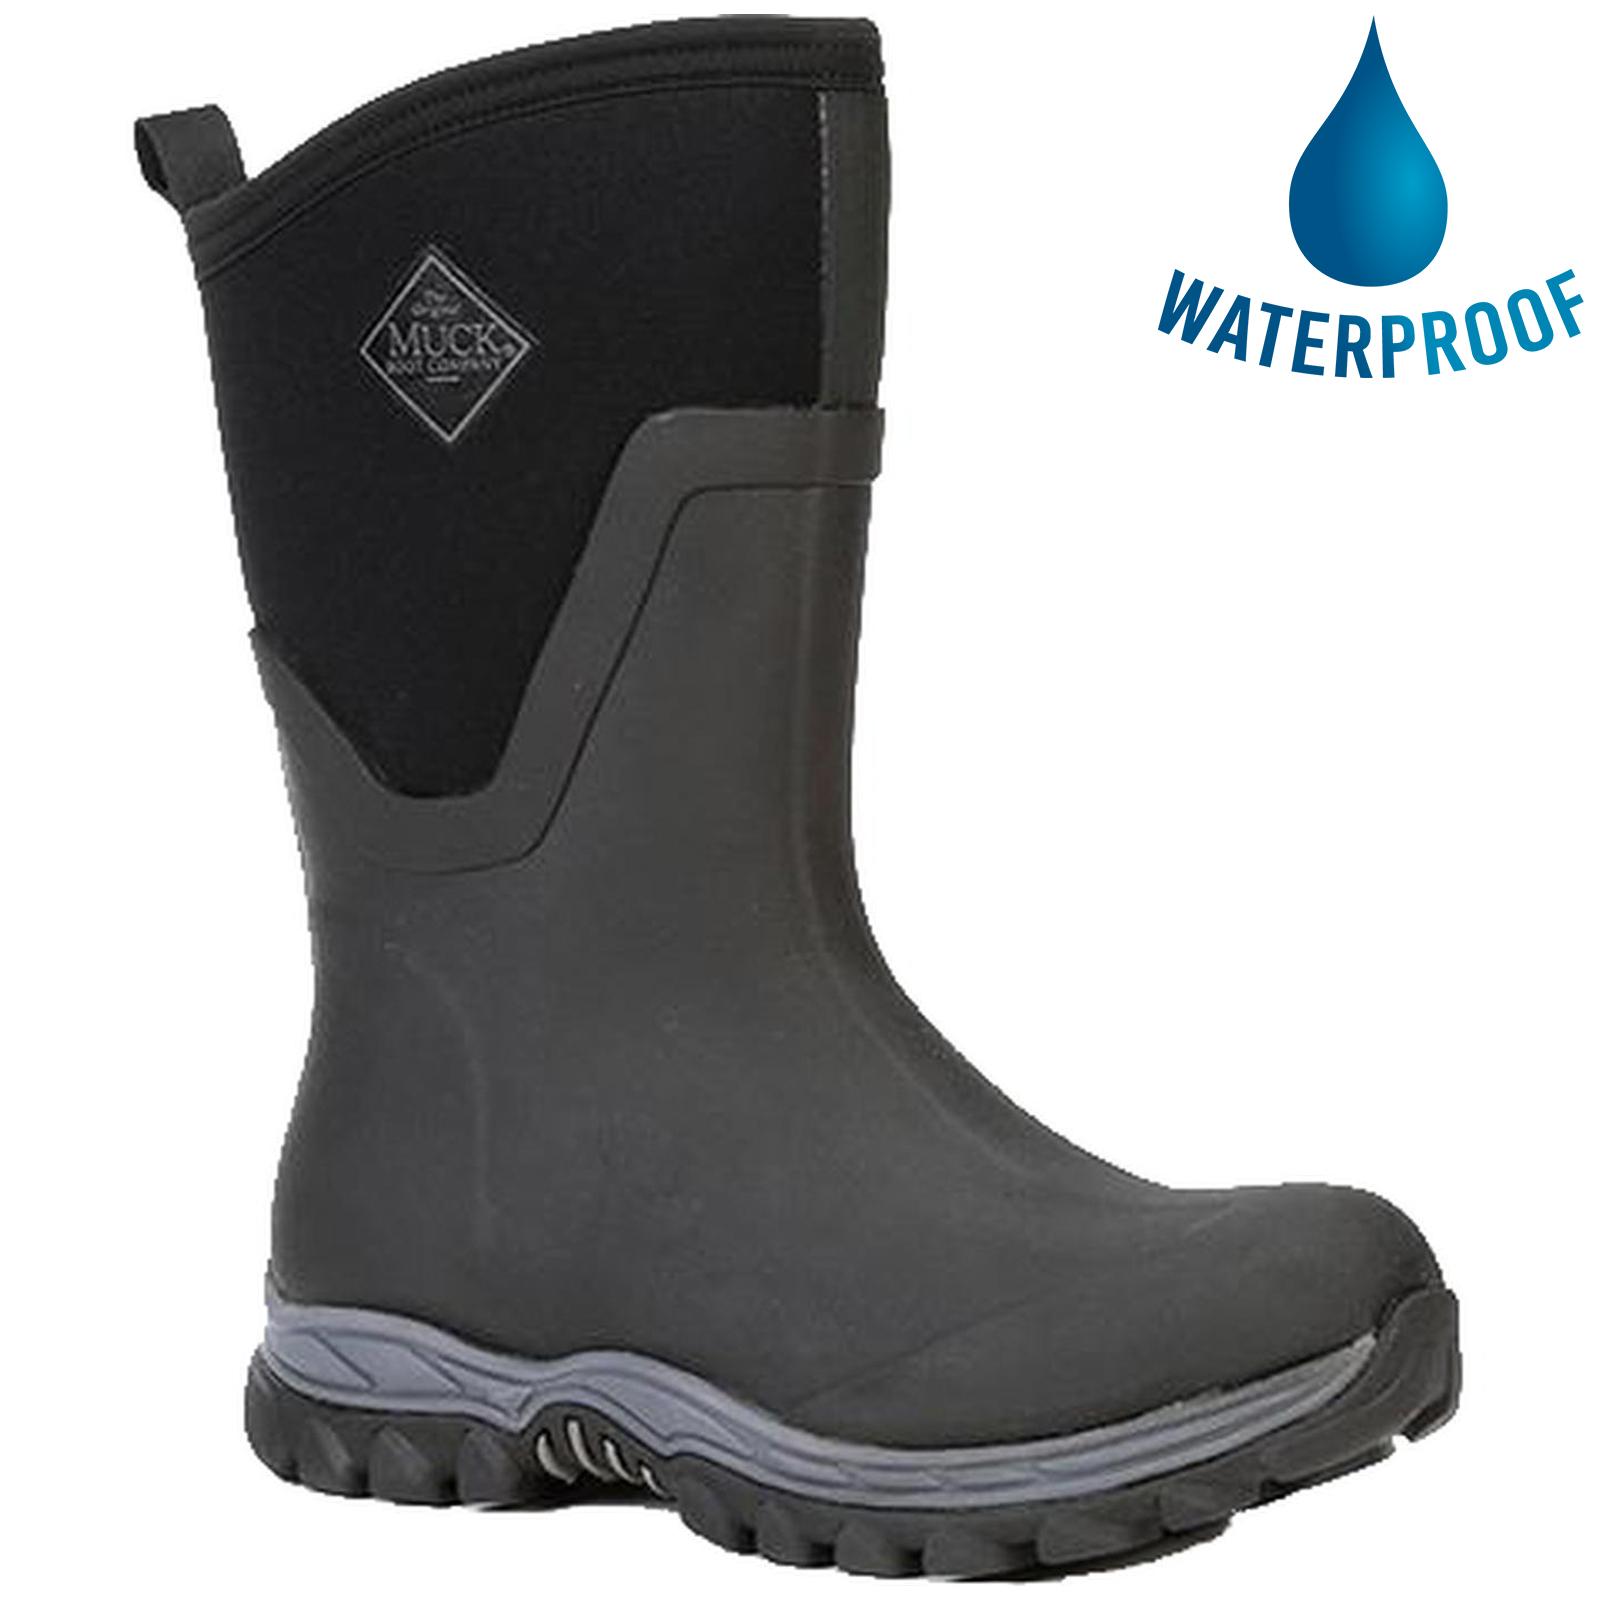 Muck Boots Womens Arctic Sport II Mid Neoprene Wellies Rain Boots - Black